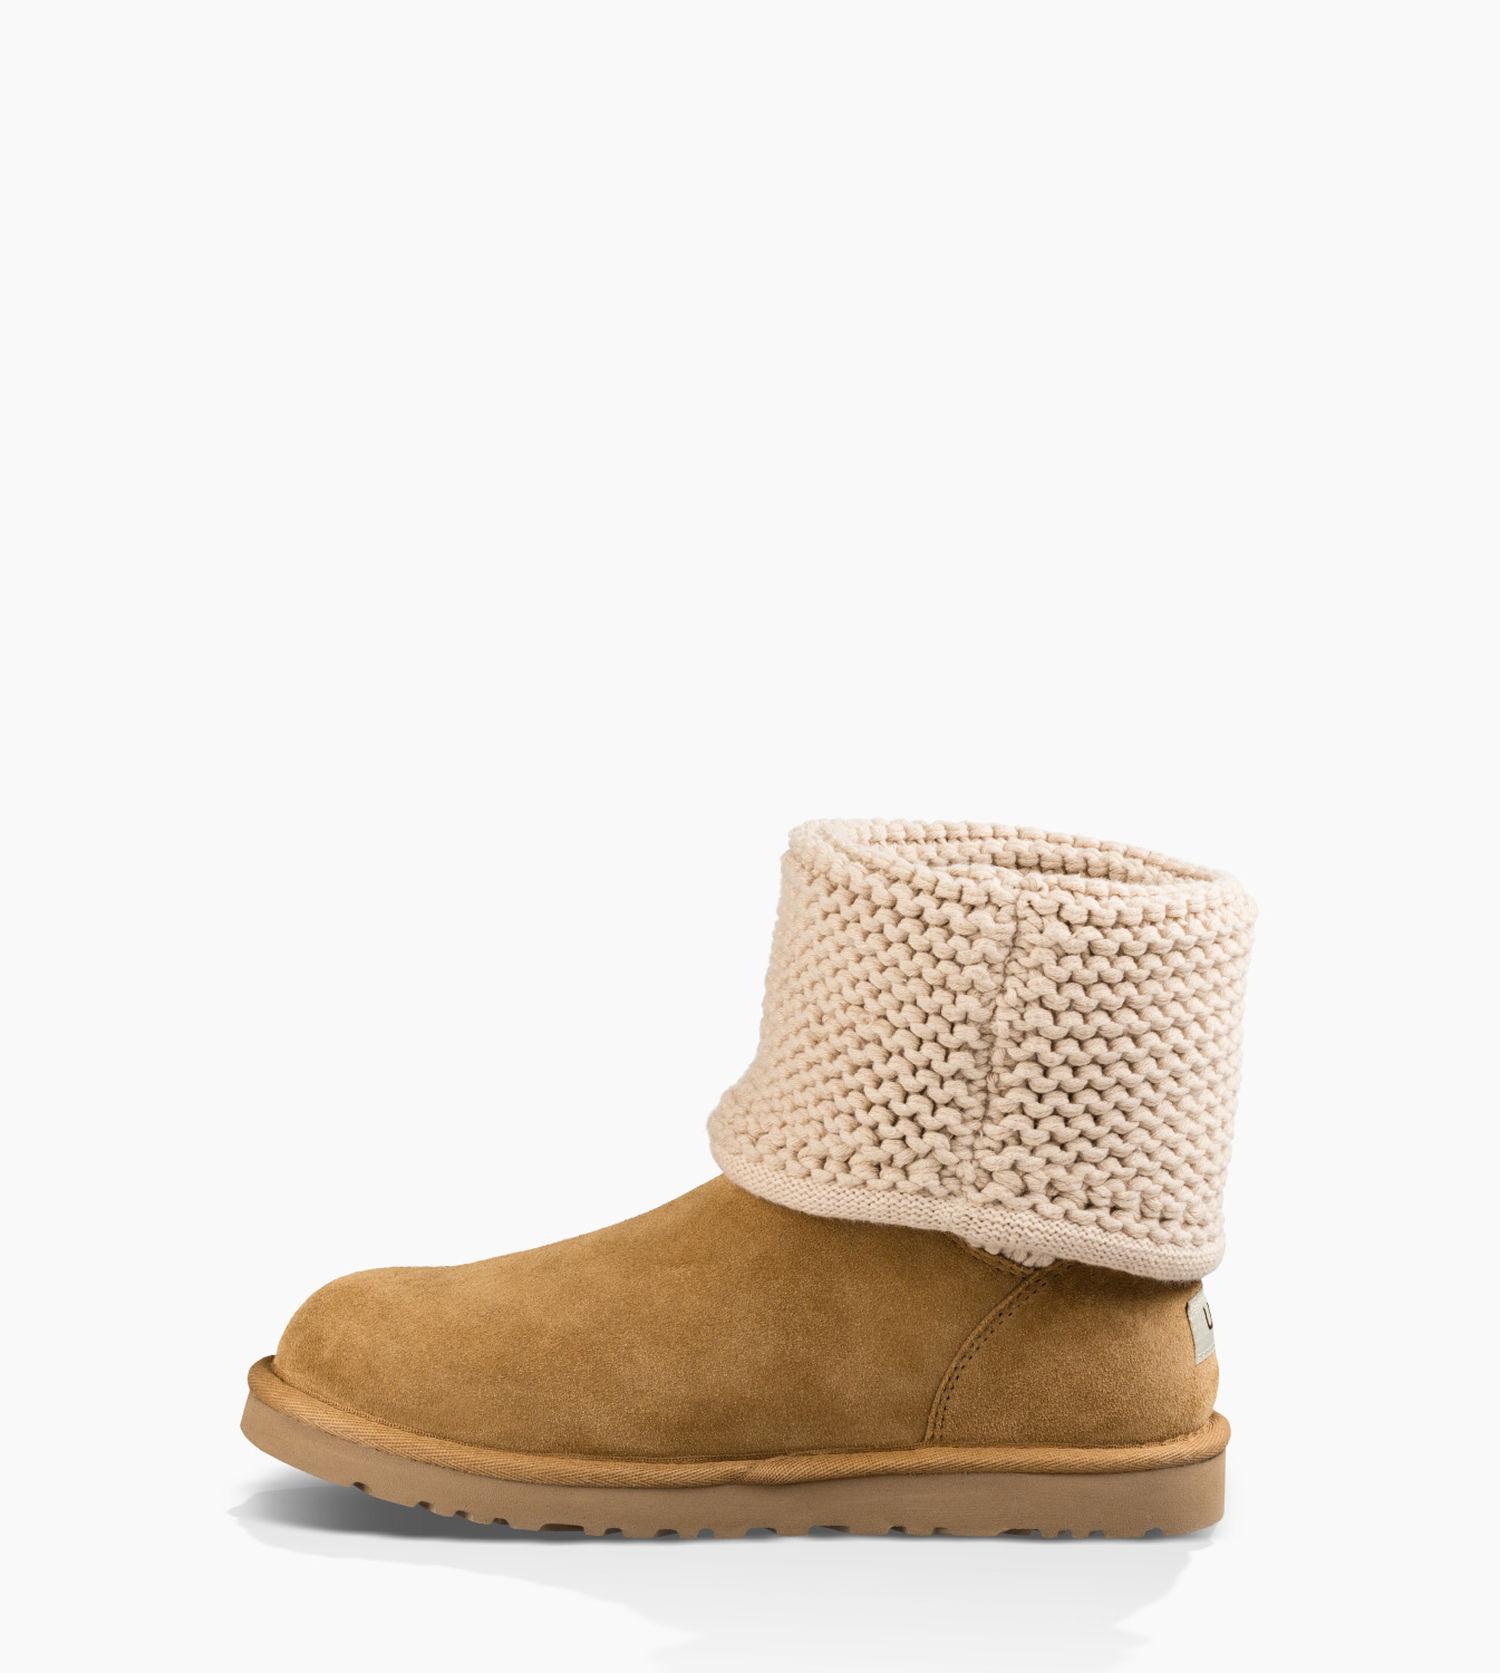 Ugg shaina womens boots 2